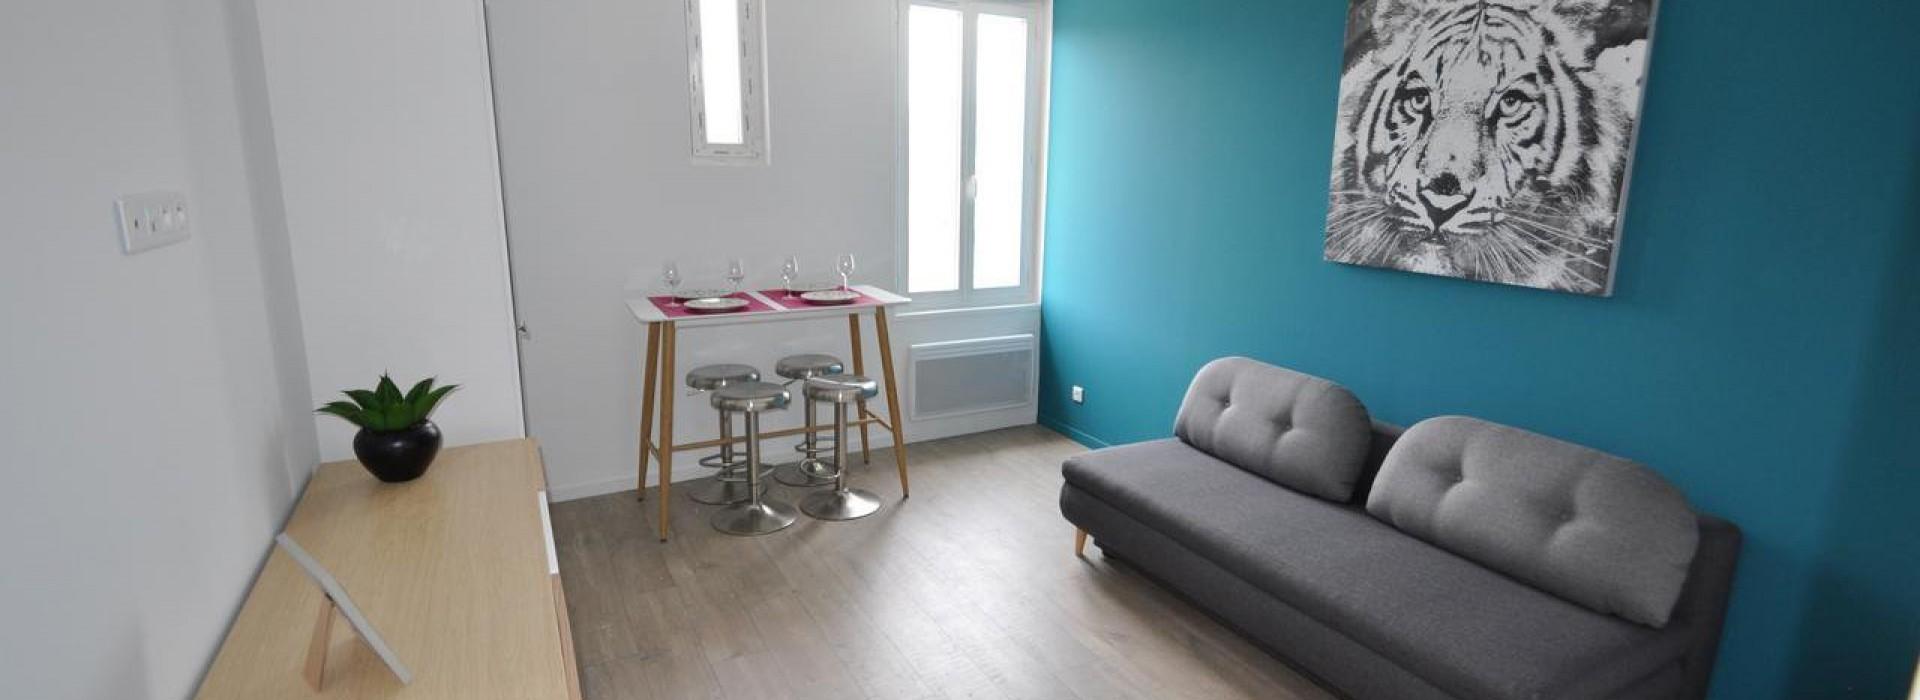 Appartement Nice 1 Pièce 22m2 135,000€